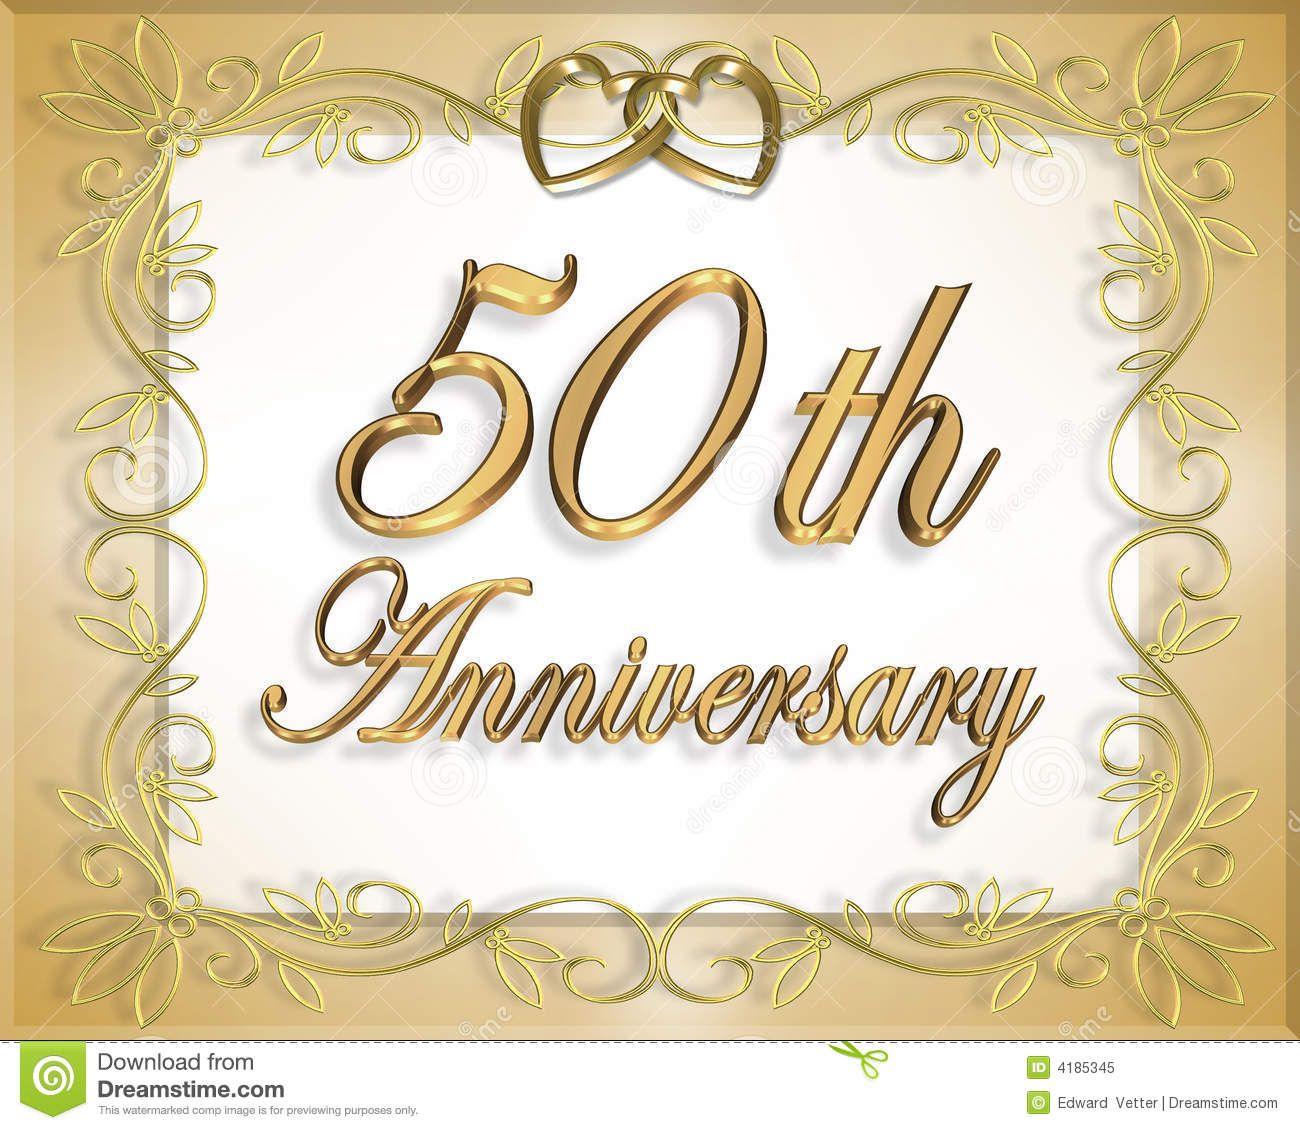 50th Wedding Anniversary Card Royalty Free Stock Image - Image ...